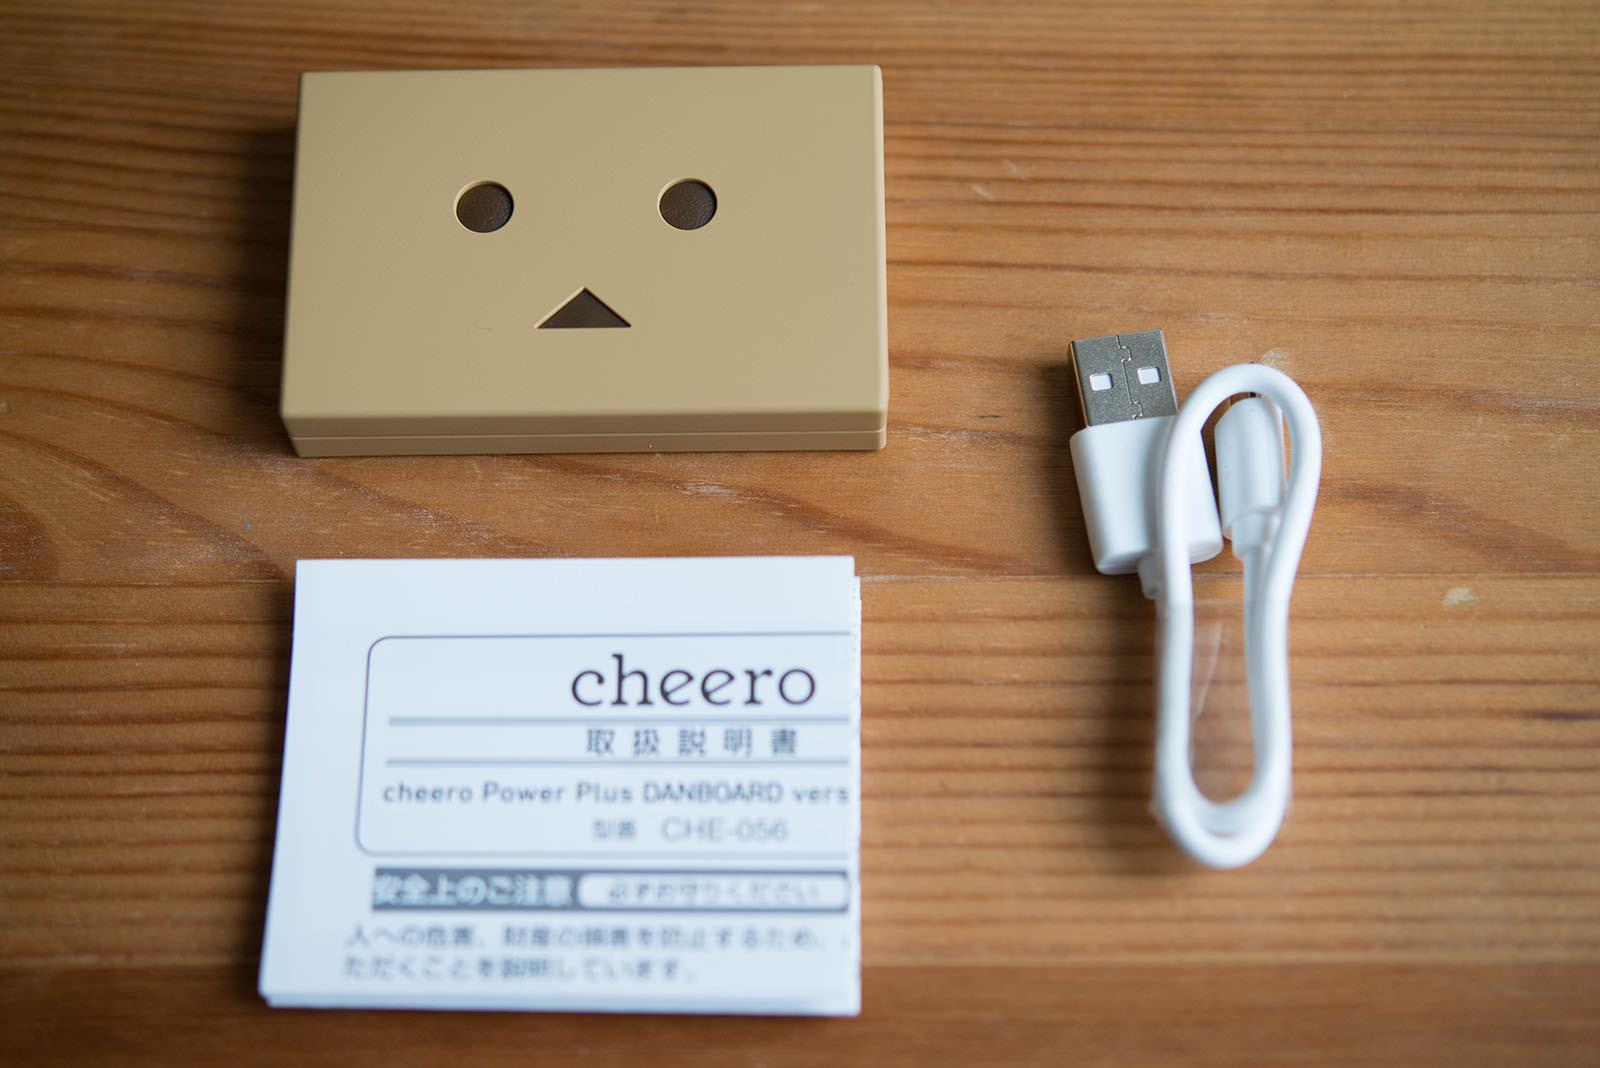 cheero Power Plus DANBOARD version block review_03